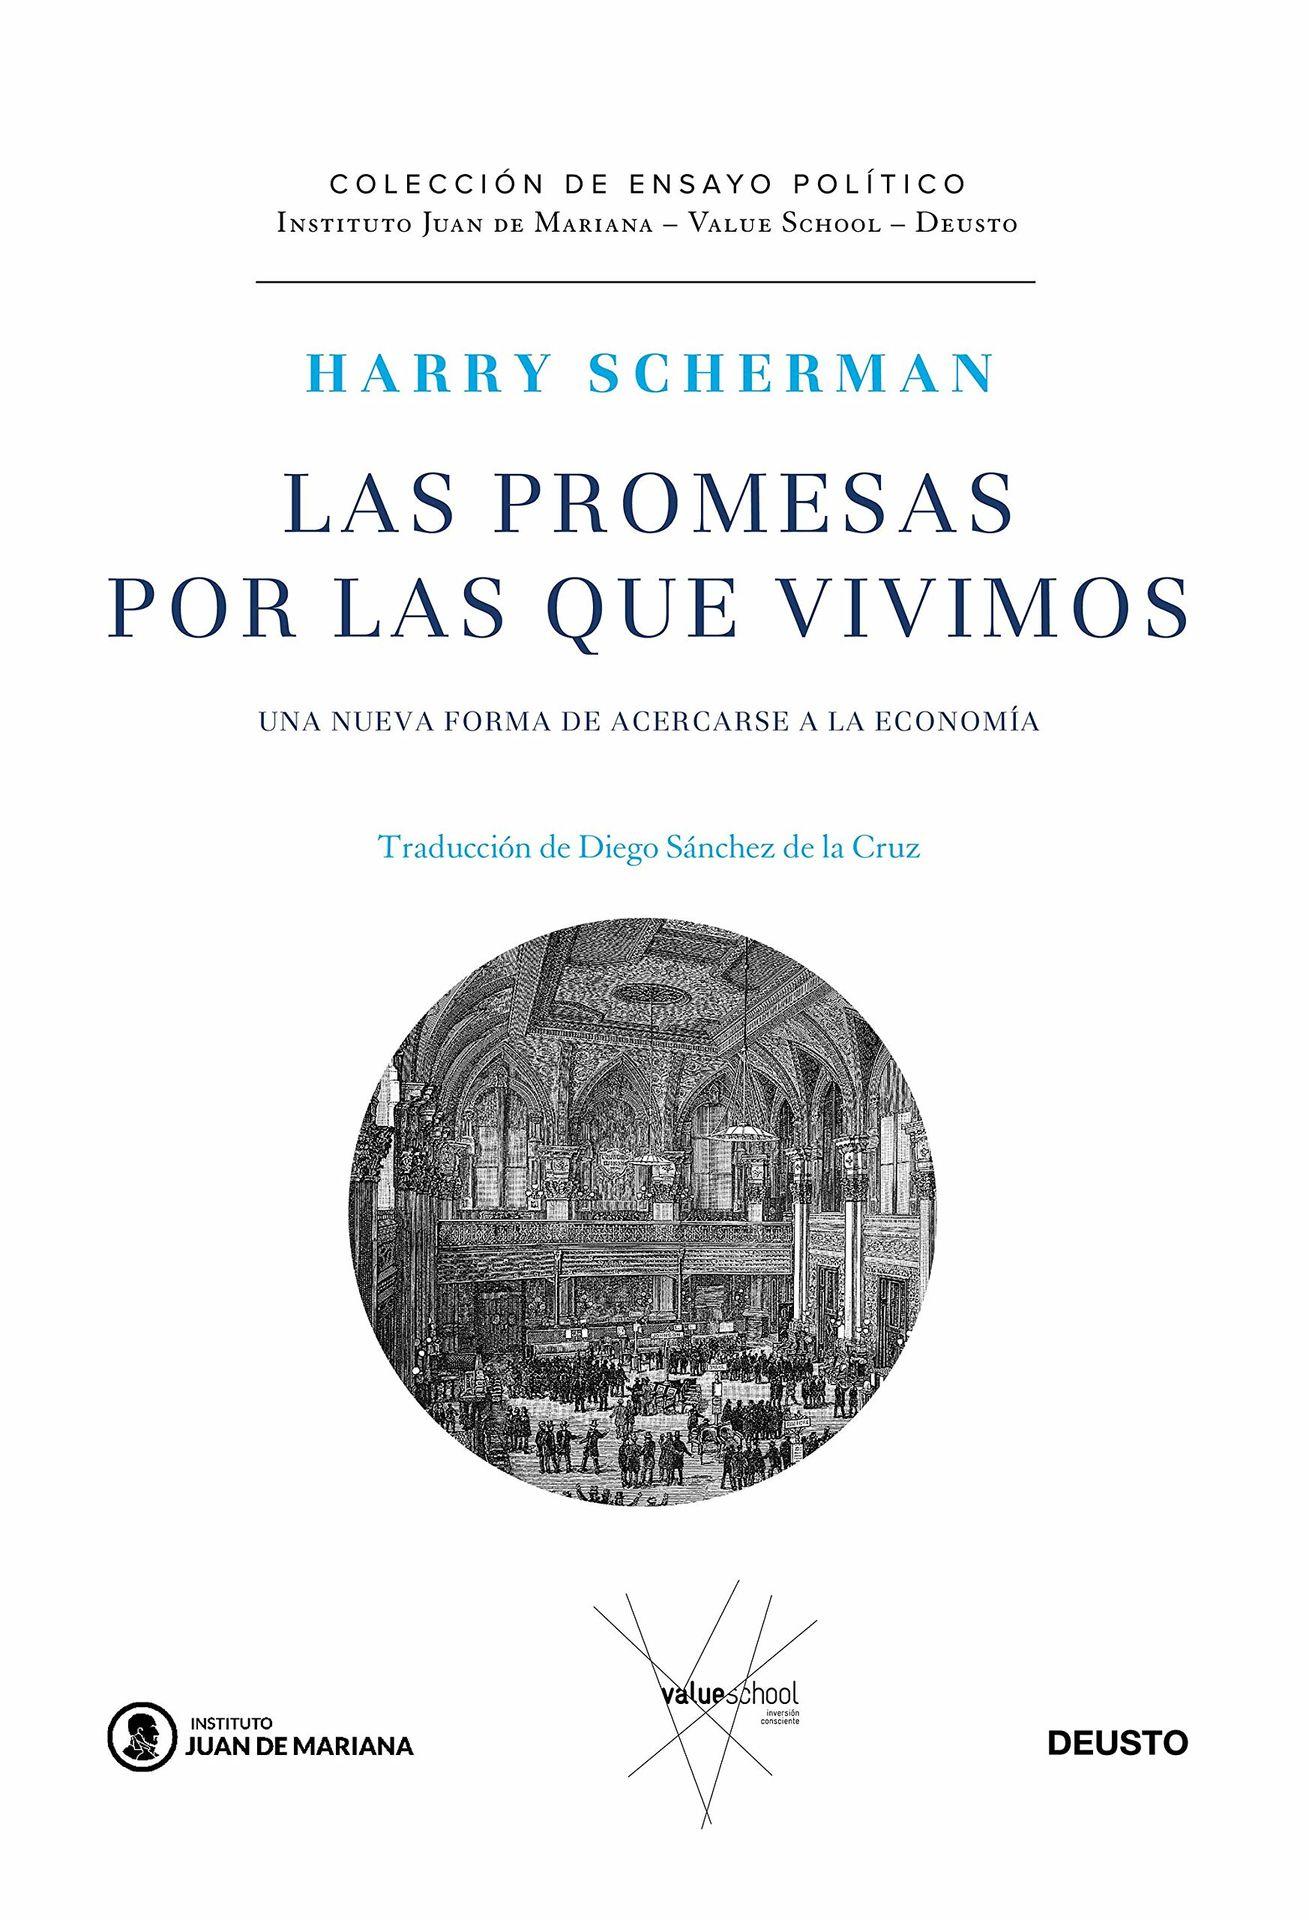 promesas-scherman-1.jpg